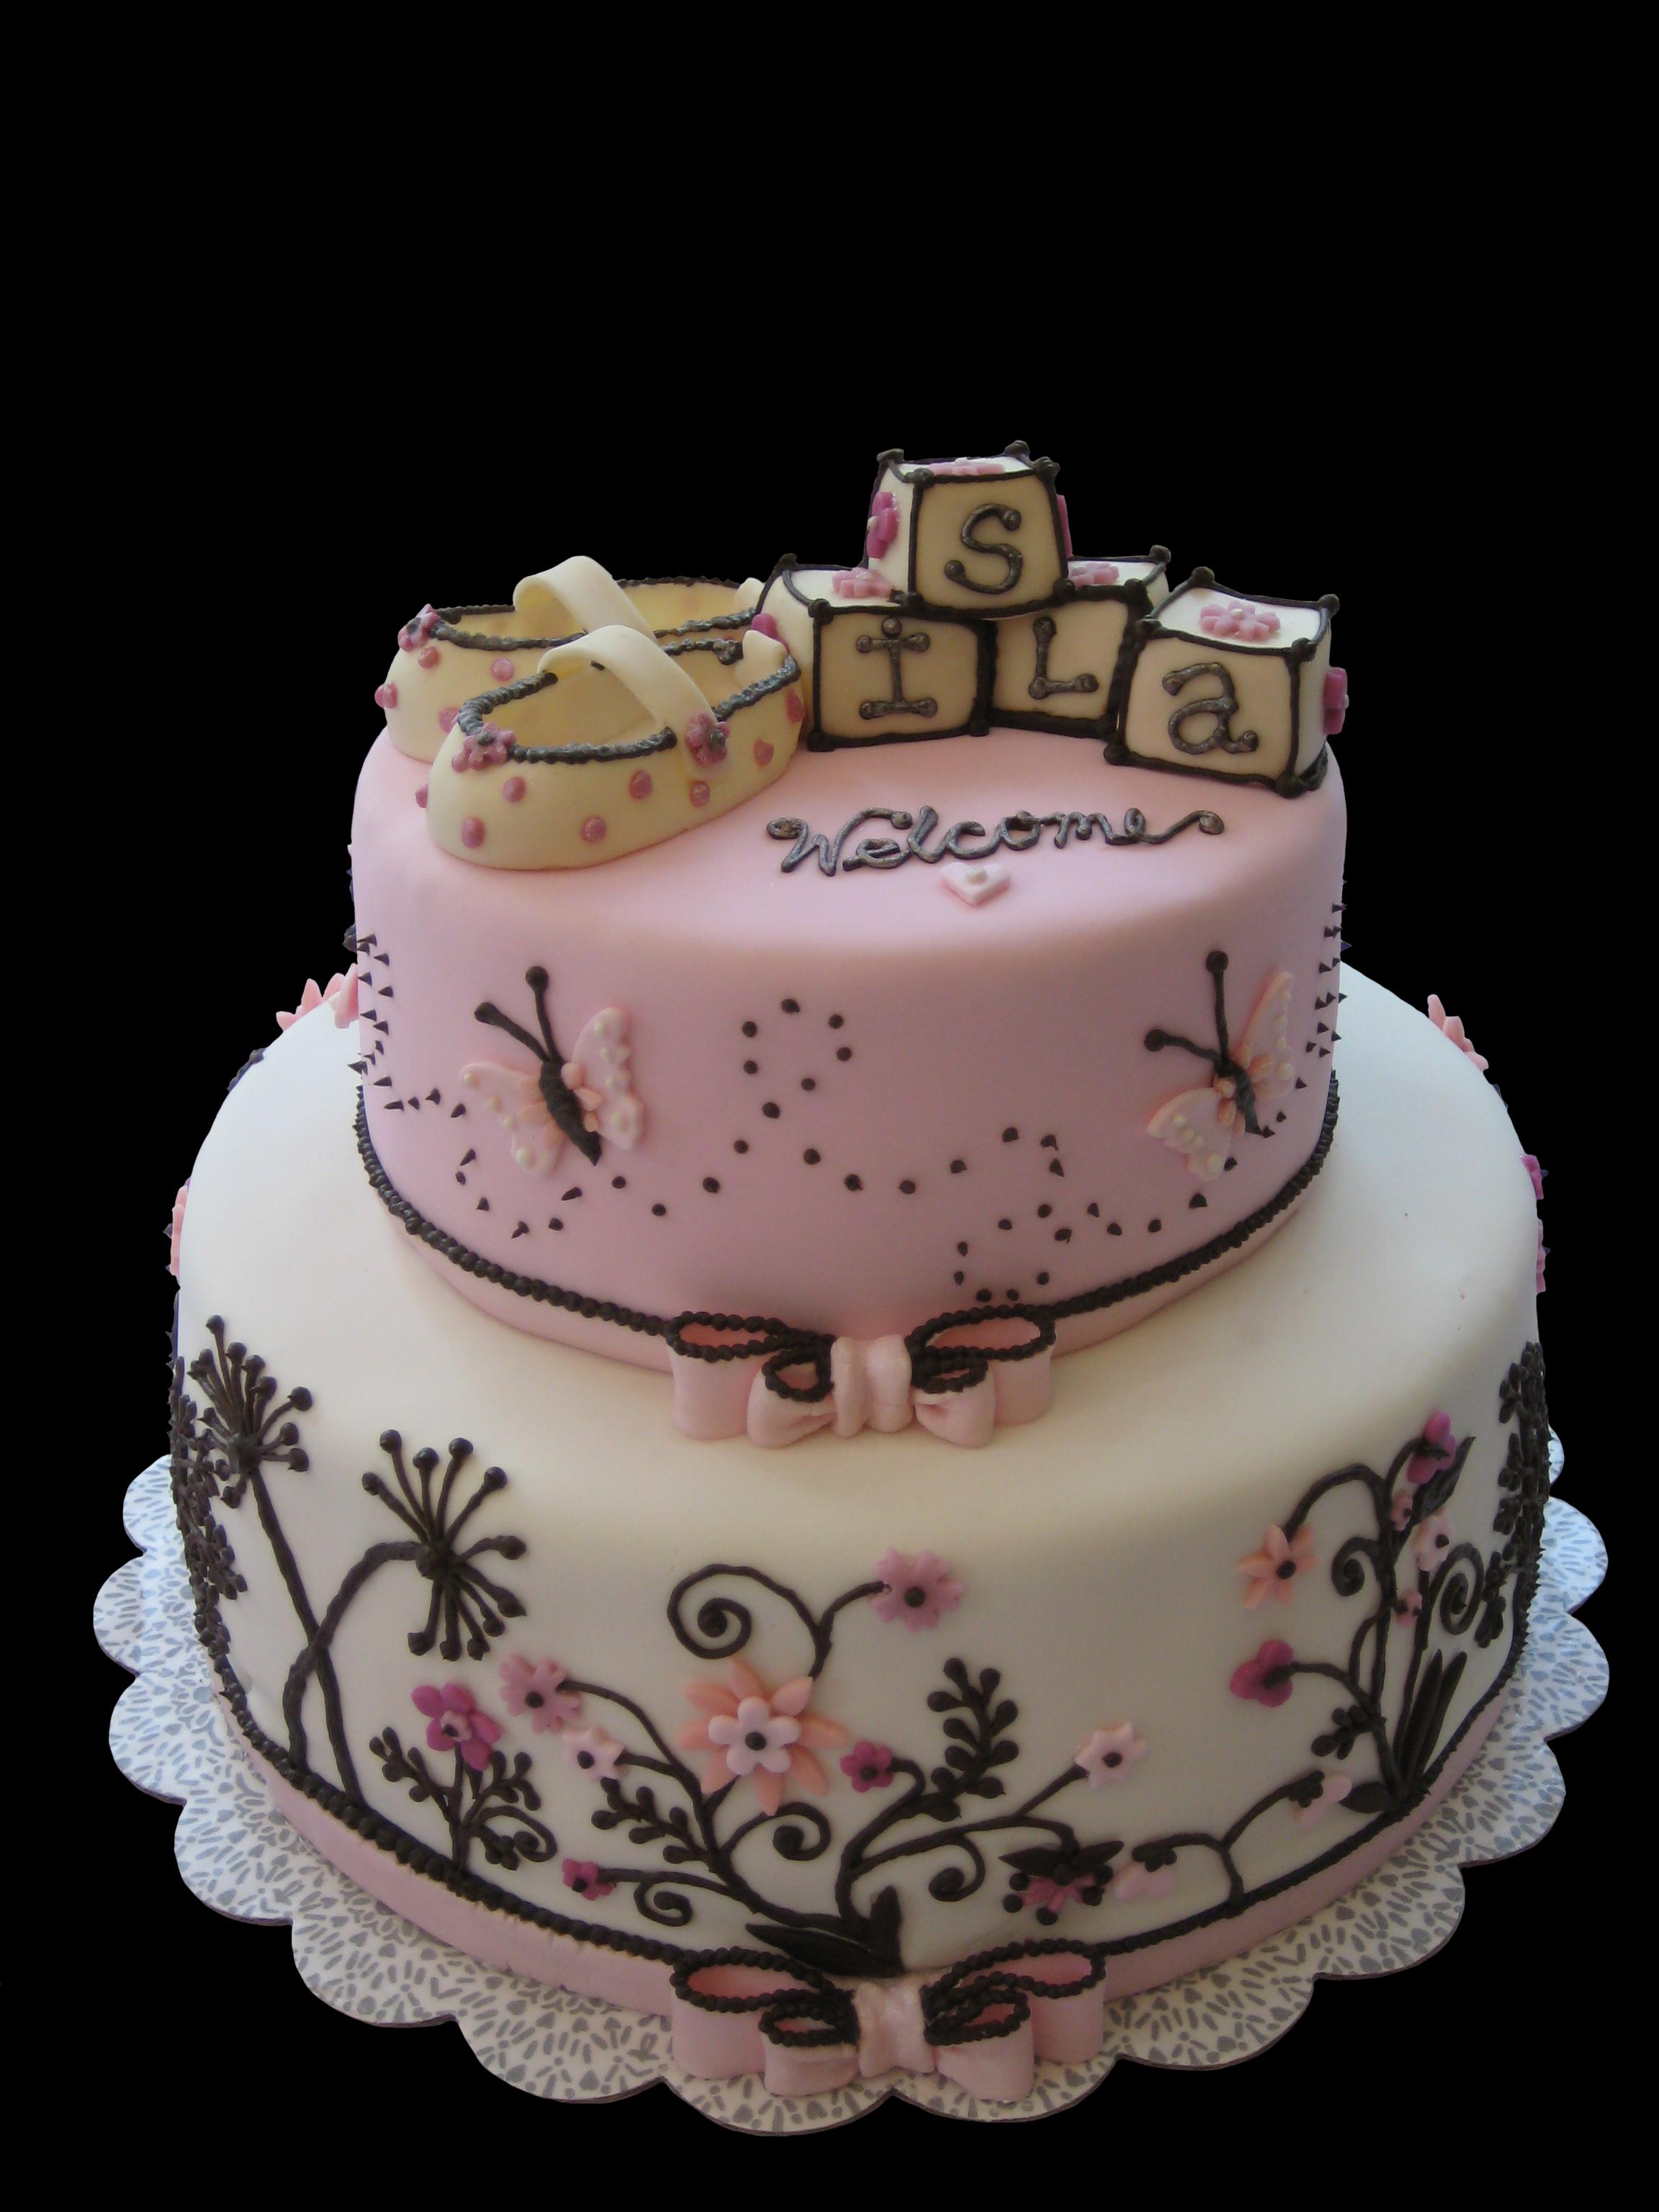 xVintage Baby Cake.jpg